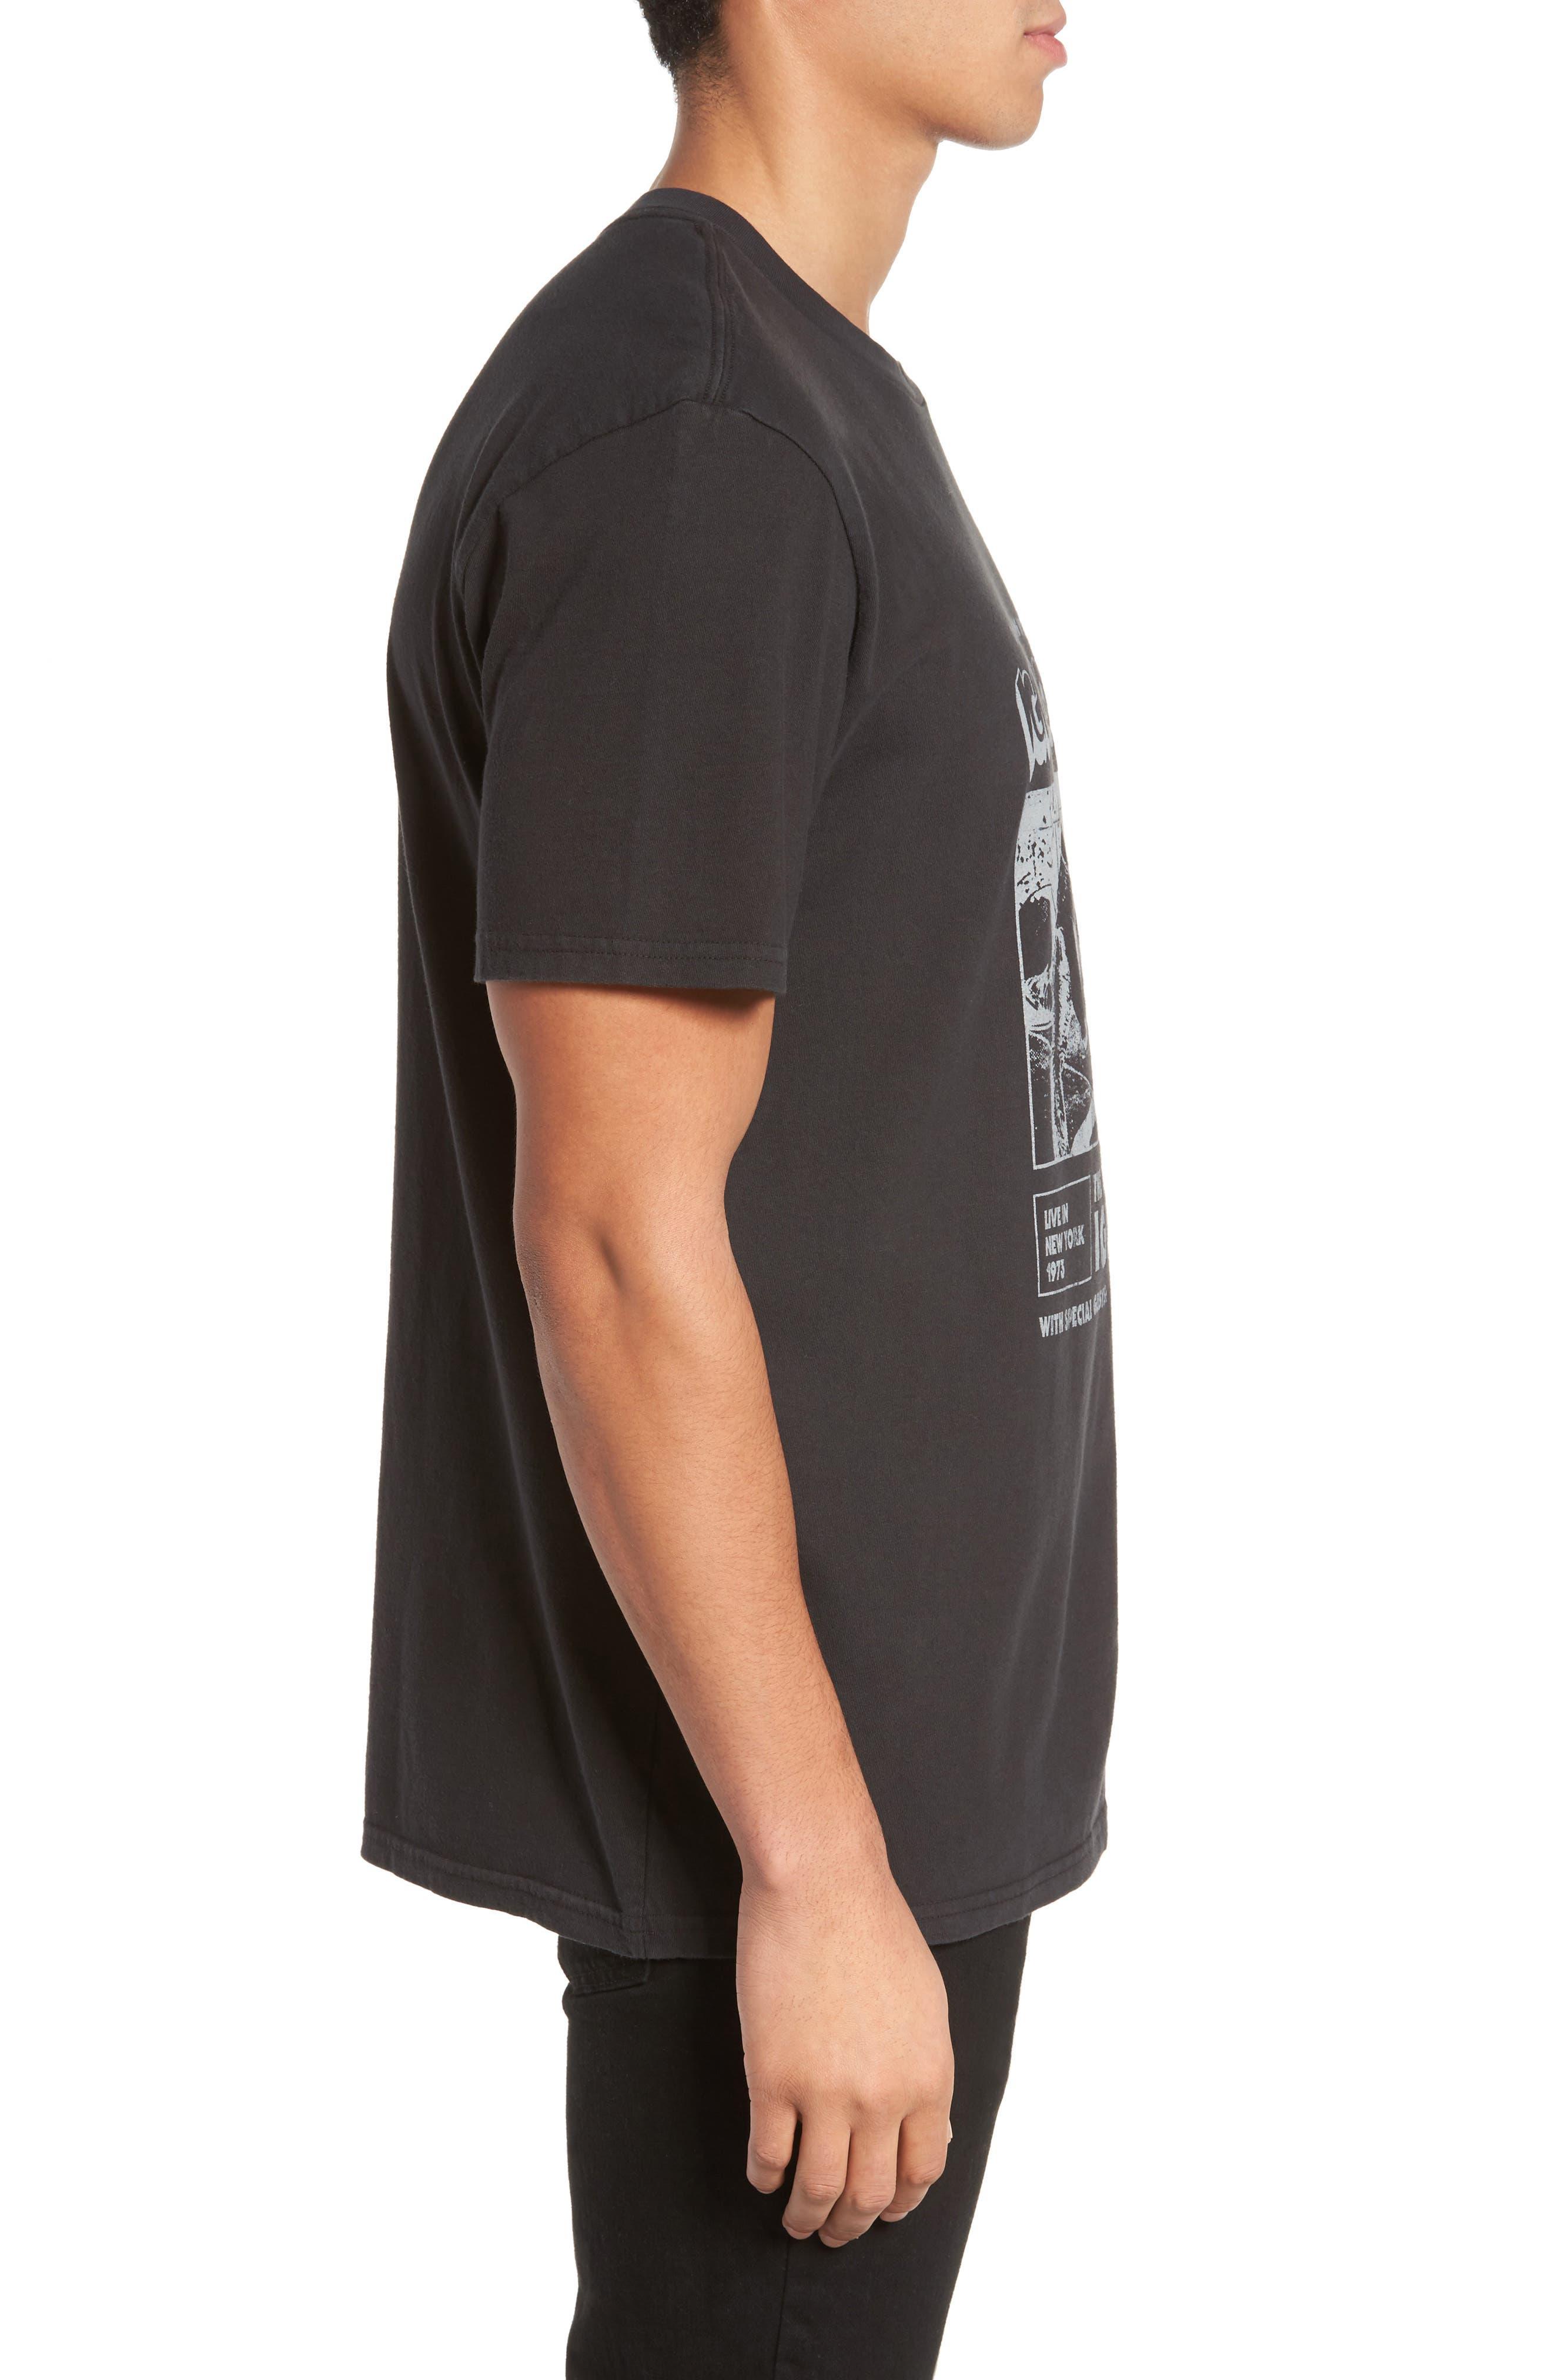 Iggy Pop x Billabong Iguana T-Shirt,                             Alternate thumbnail 3, color,                             001